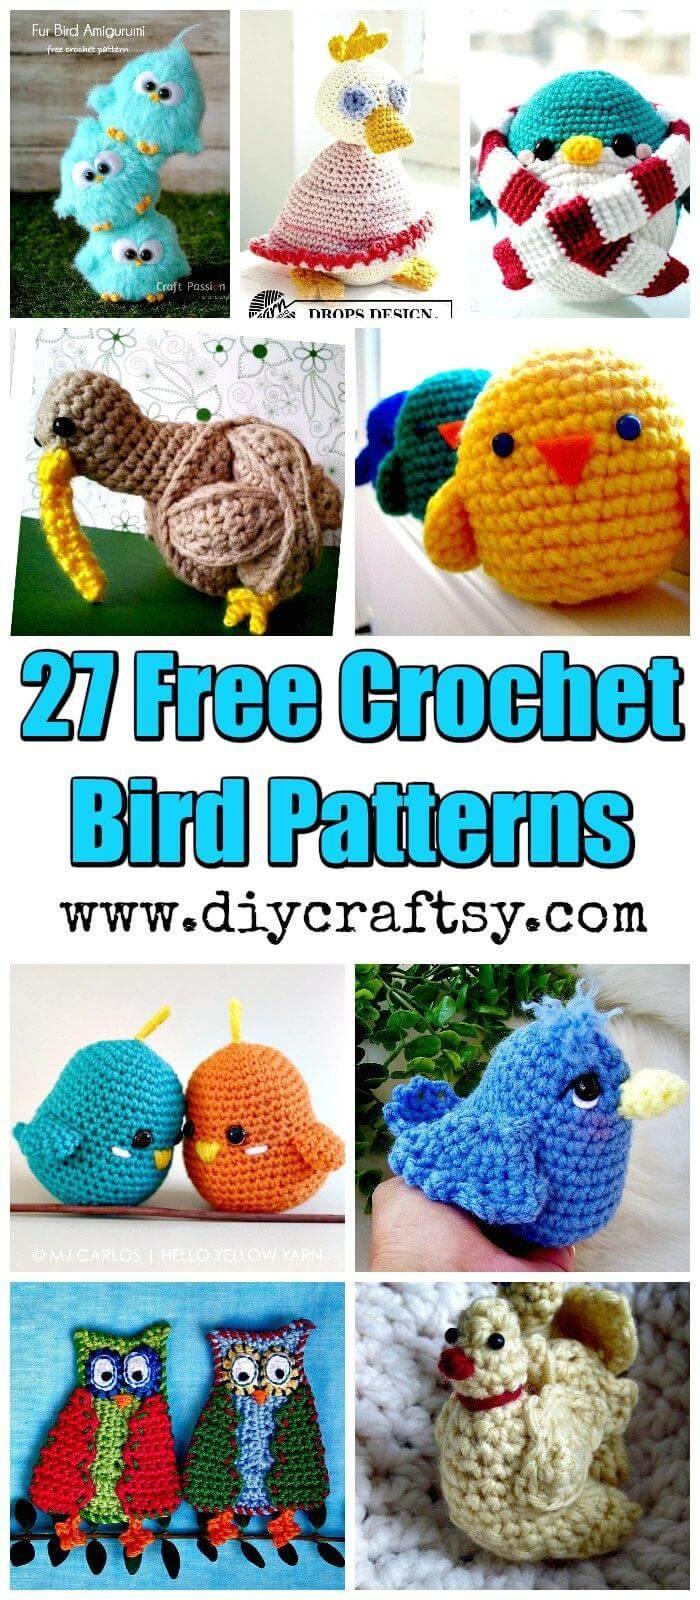 27 Free Crochet Bird Patterns You'll Love - Diy & Crafts - Free Printable Crochet Patterns